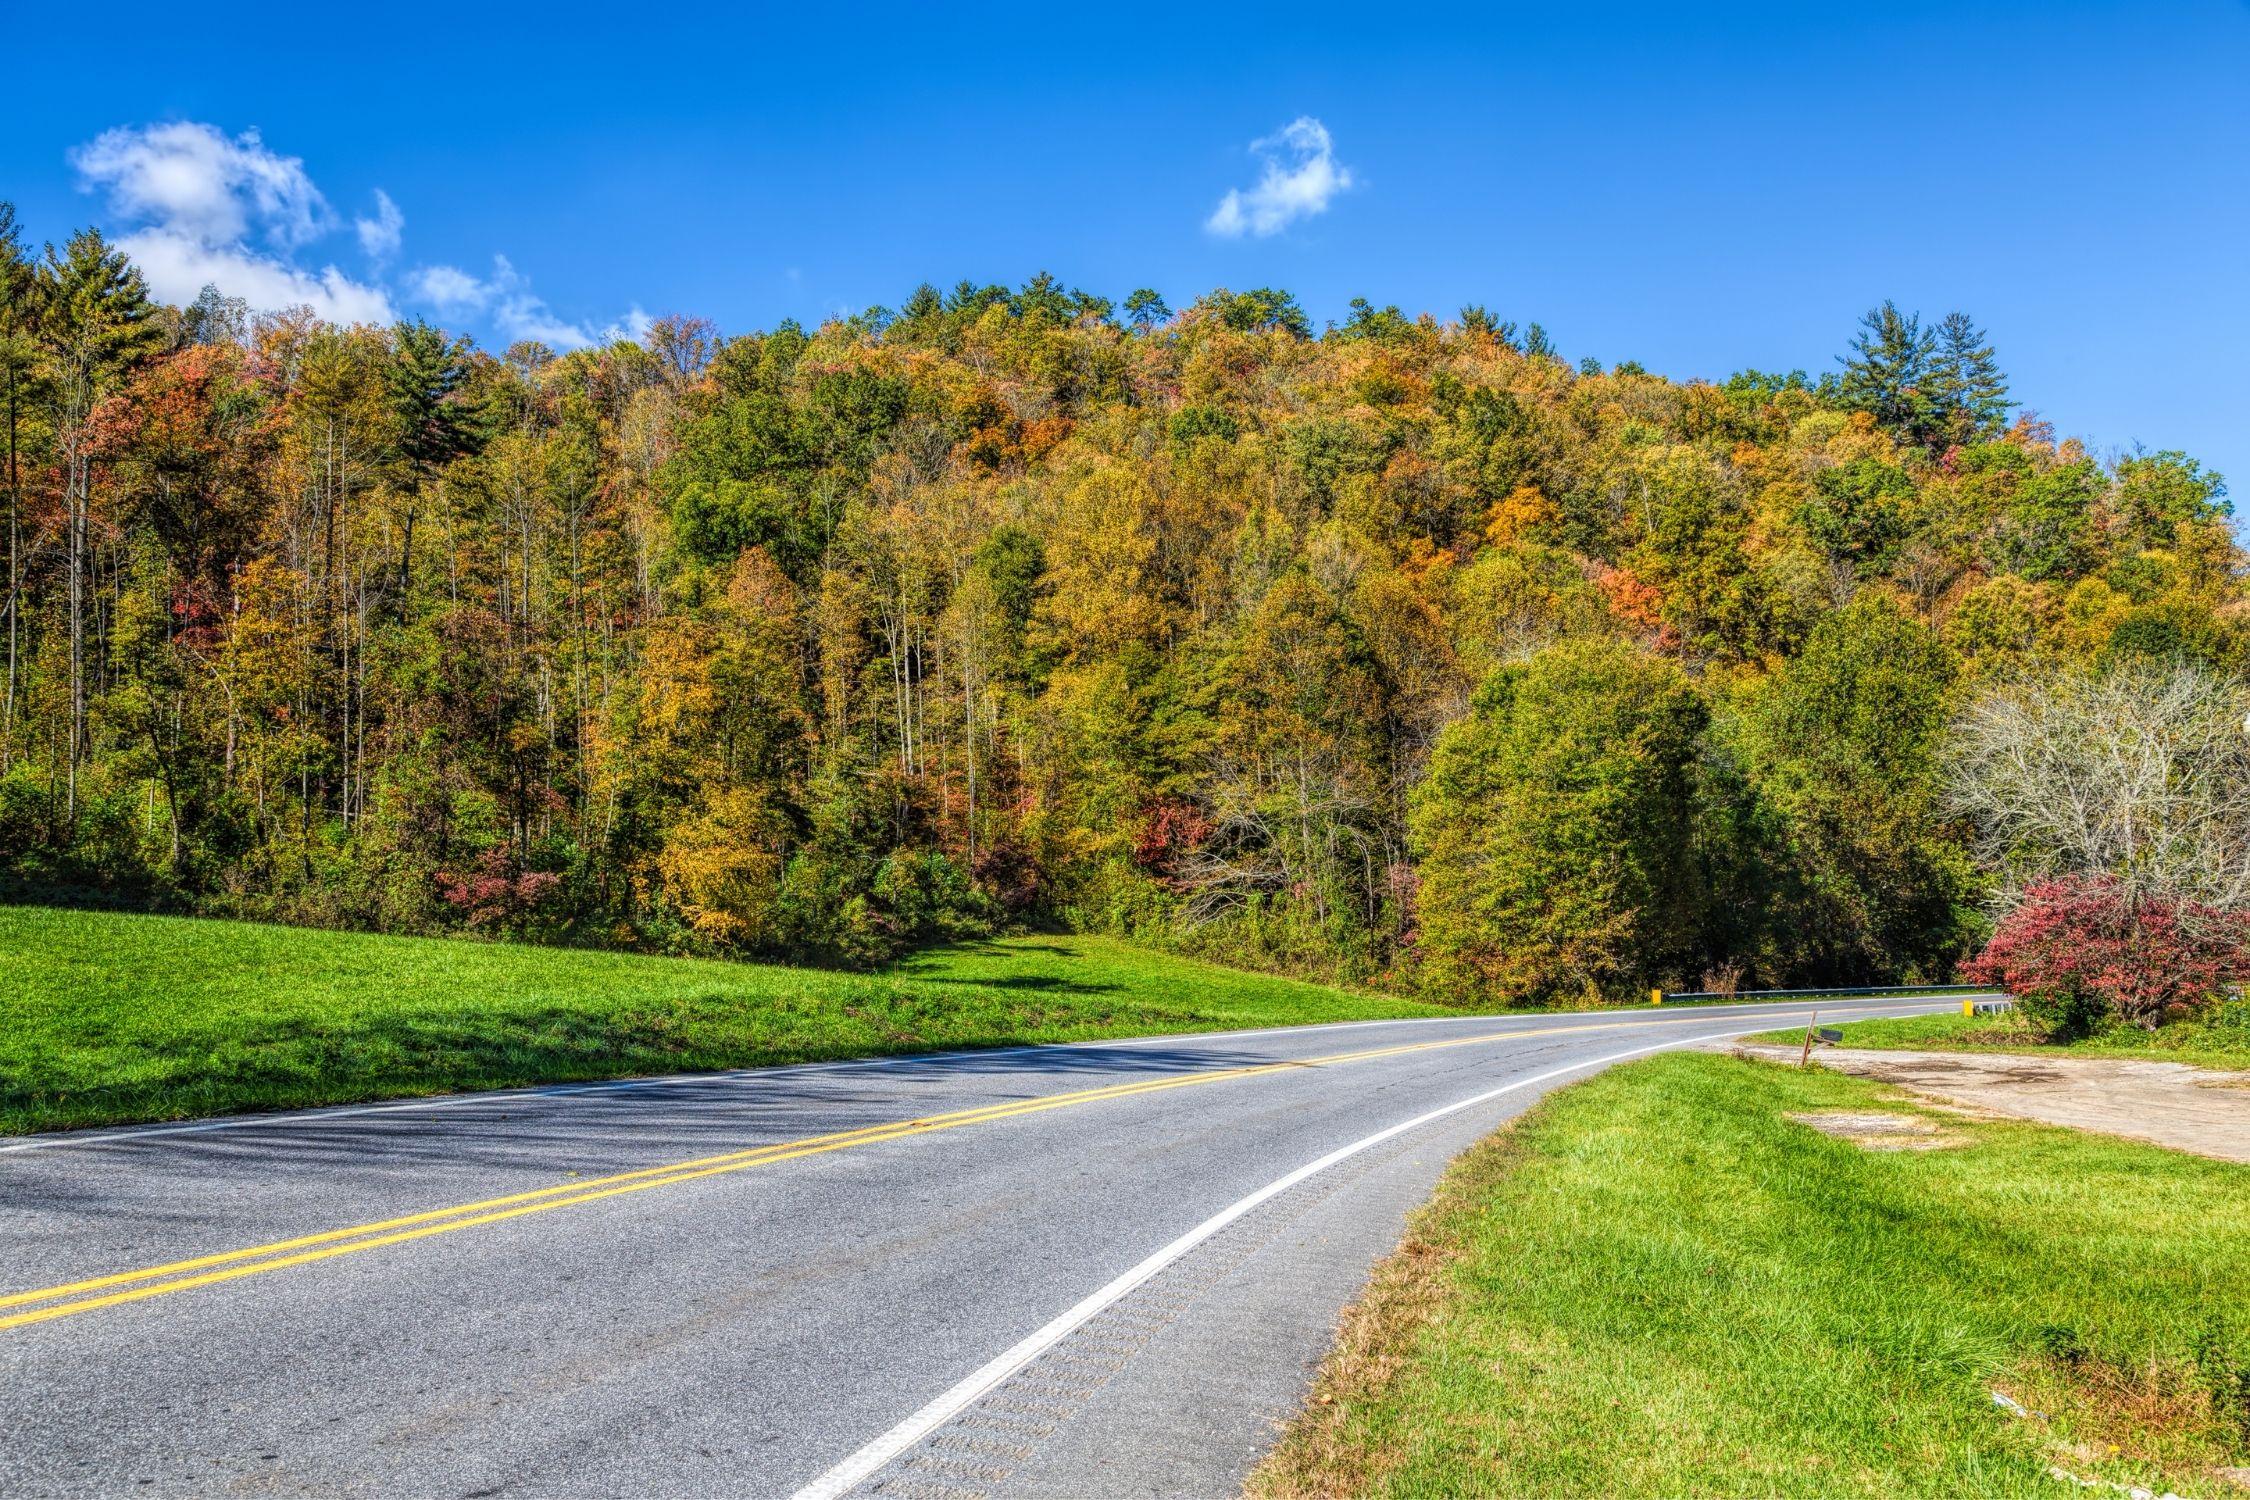 South Carolina Scenic Byway